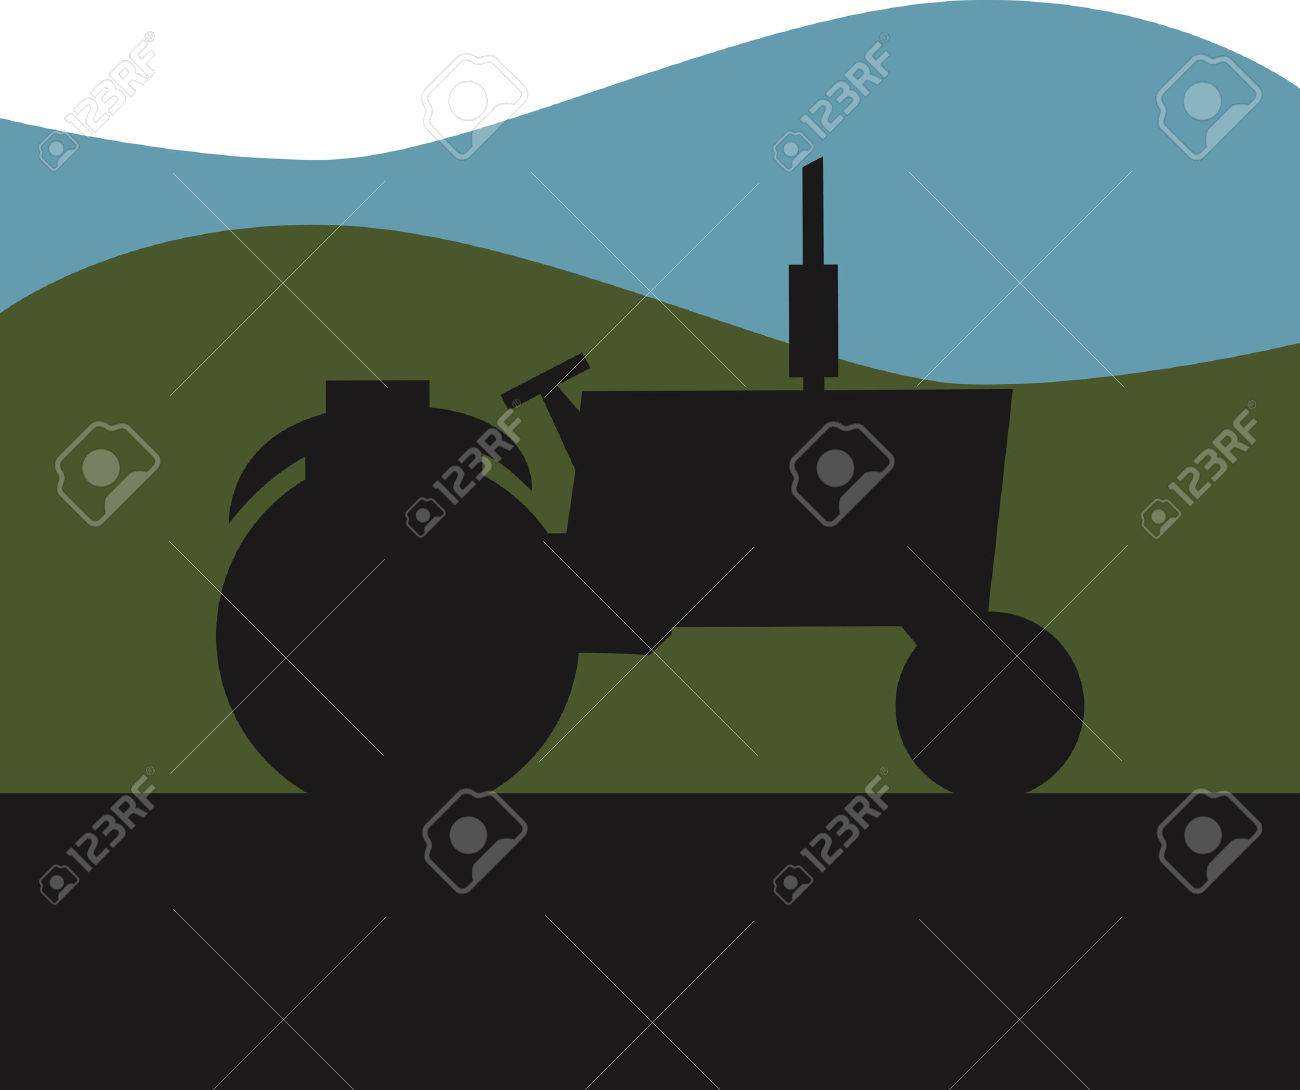 Tractor Icon Stock Vector - 8885240